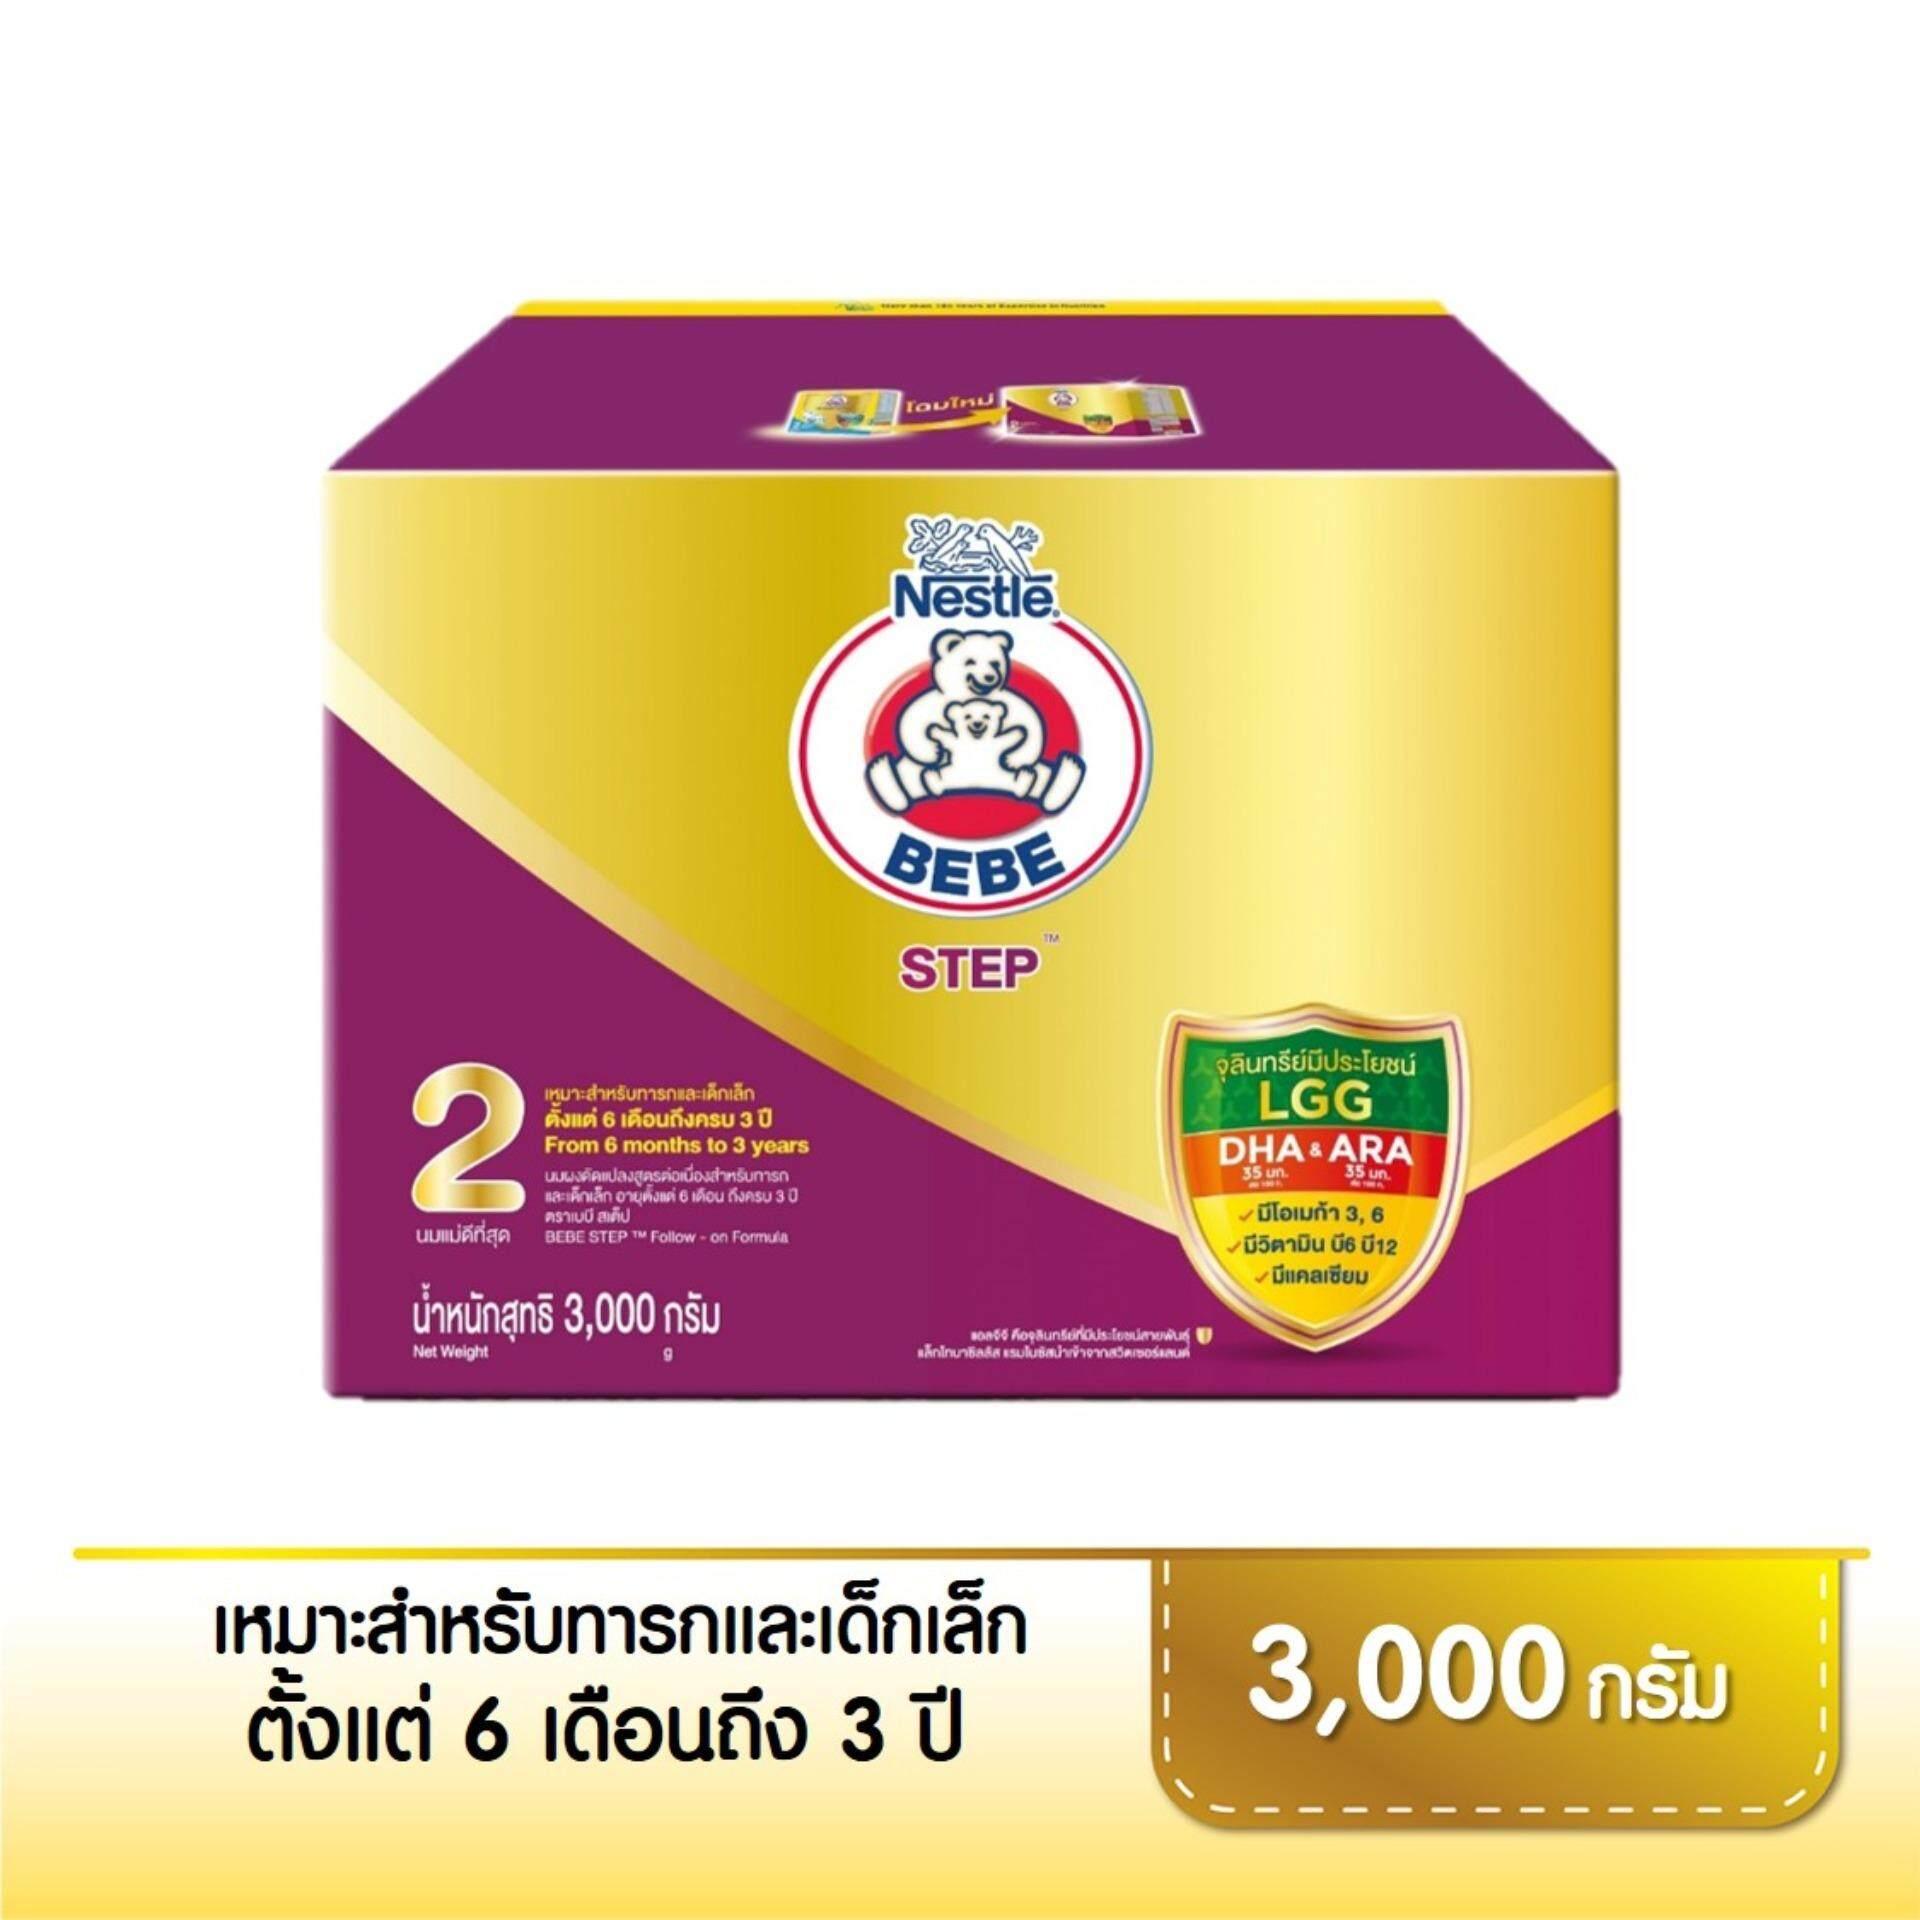 Bear Brand ตราหมี นมผง แอดวานซ์ โพรเท็กซ์ชัน สูตร 2 รสจืด (3,000 กรัม).